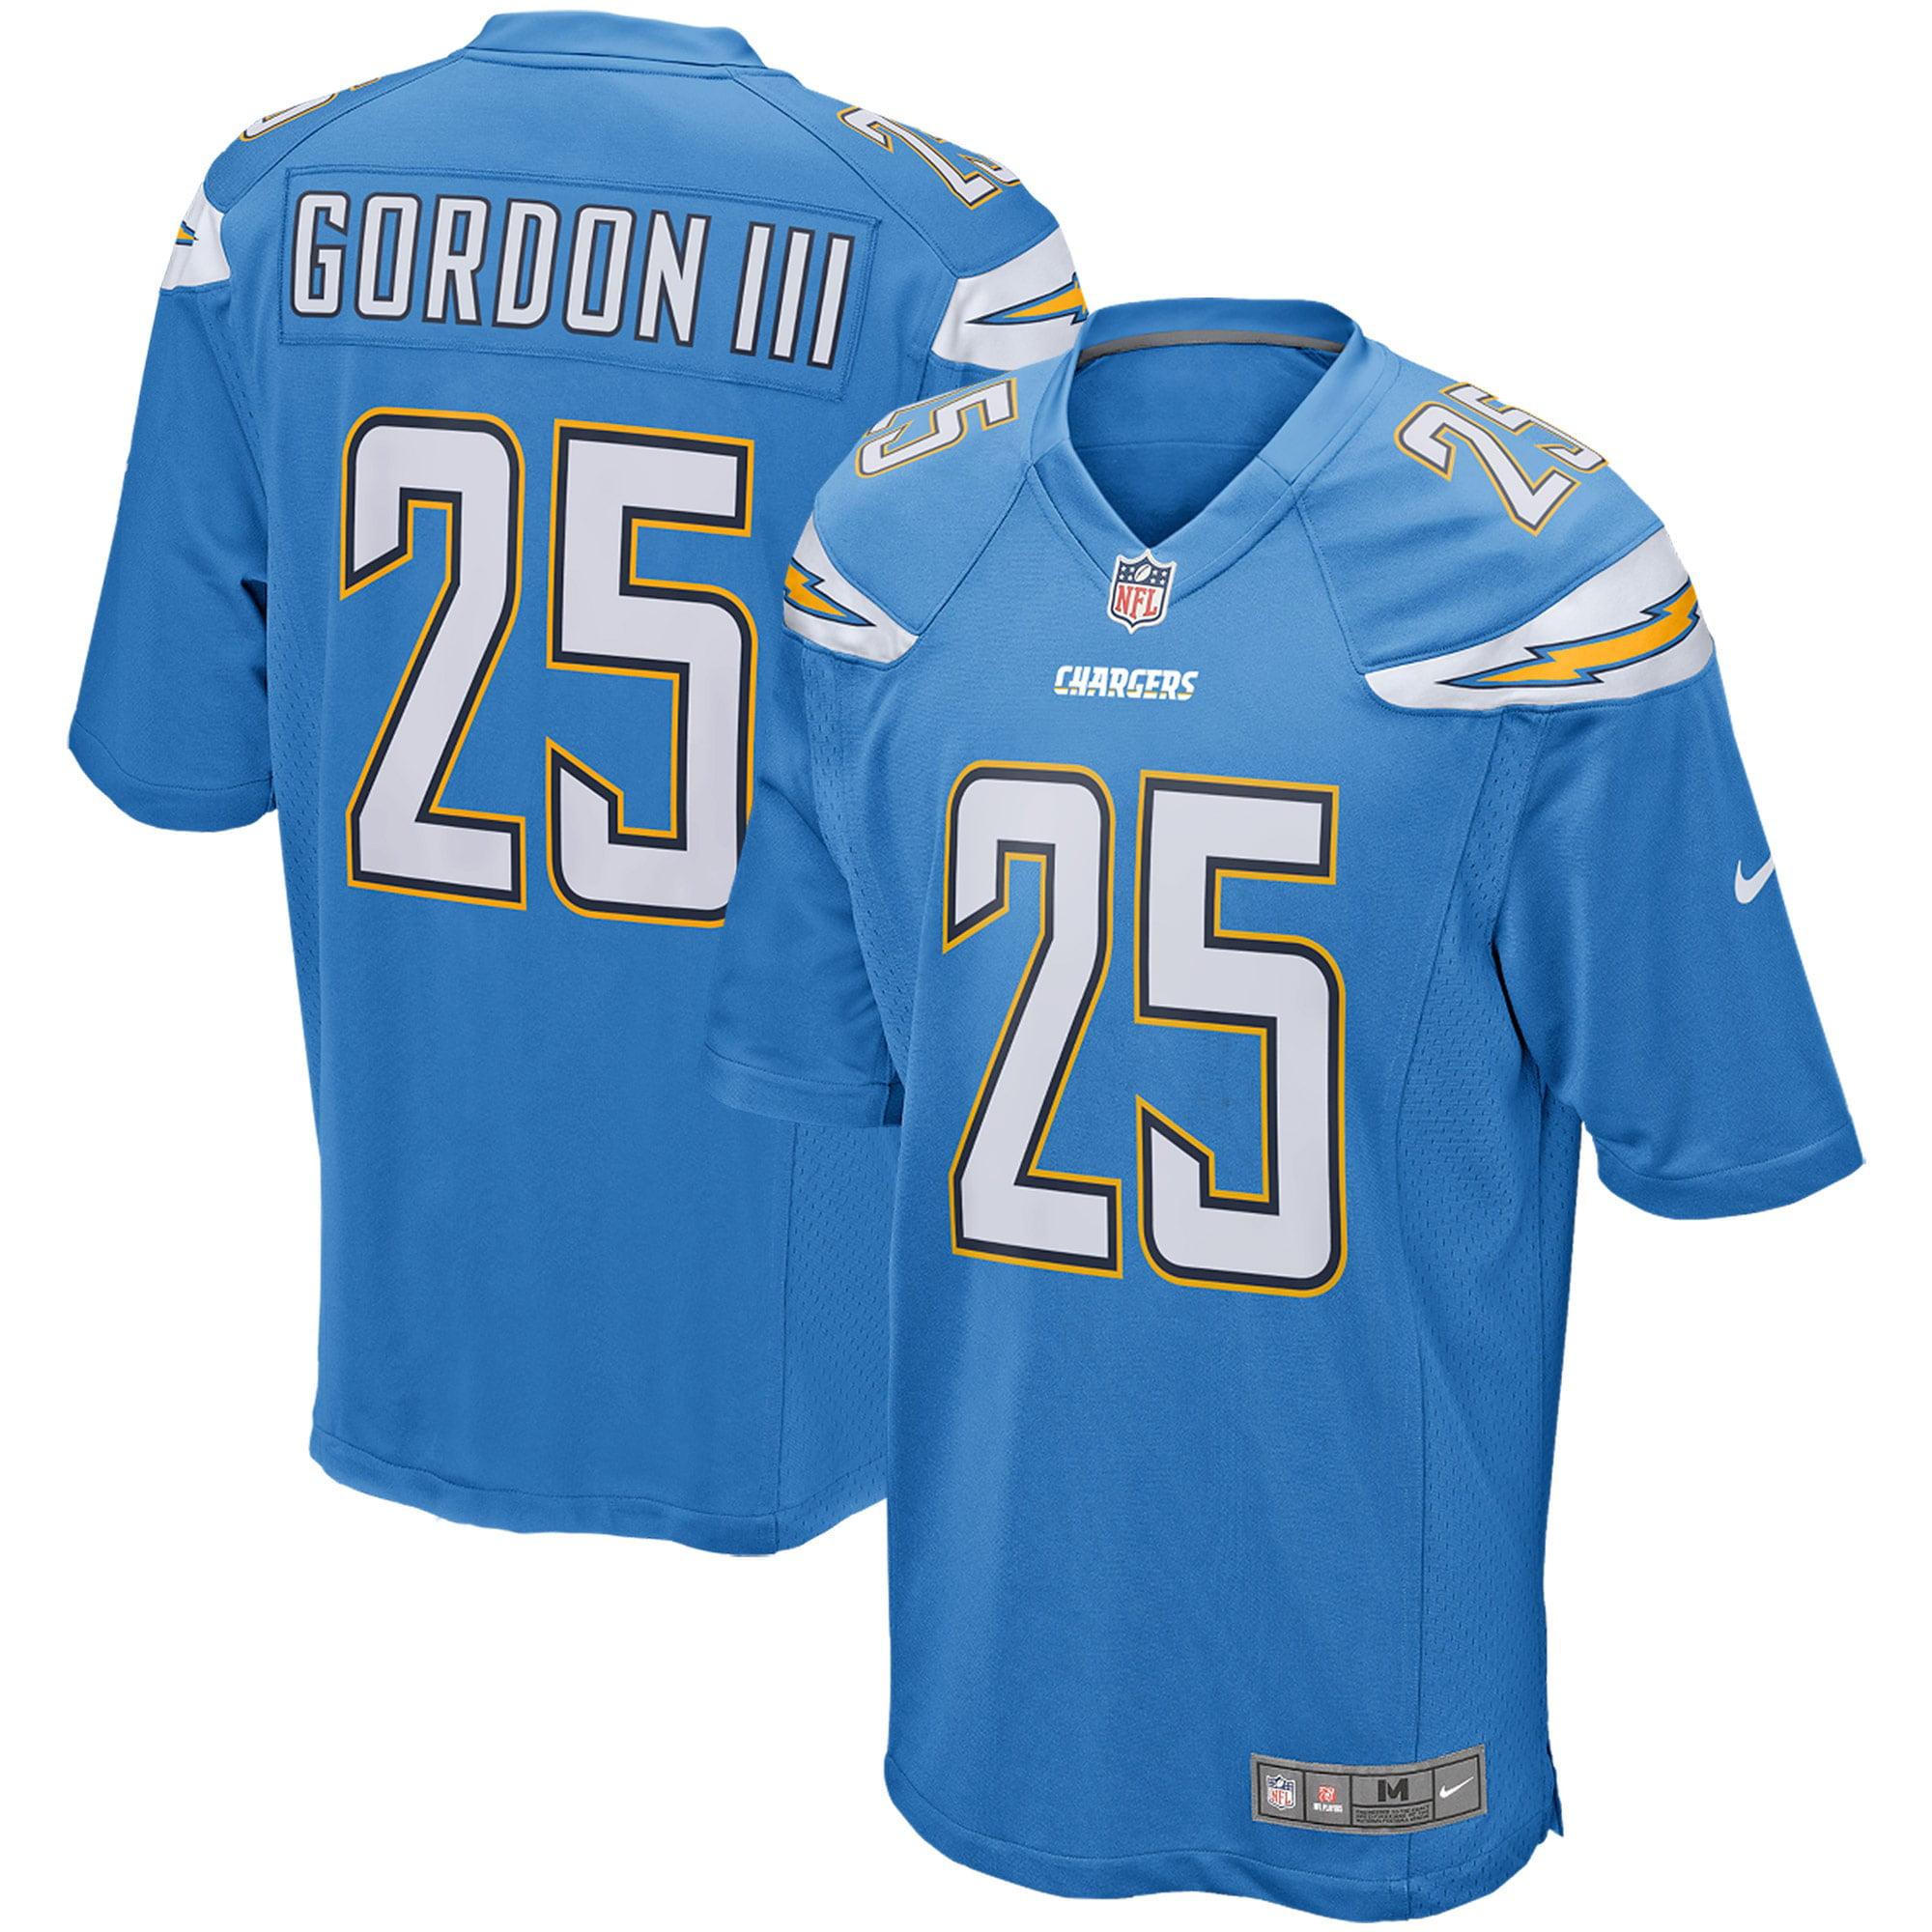 Melvin Gordon Los Angeles Chargers Nike Game Player Jersey - Powder Blue - Walmart.com